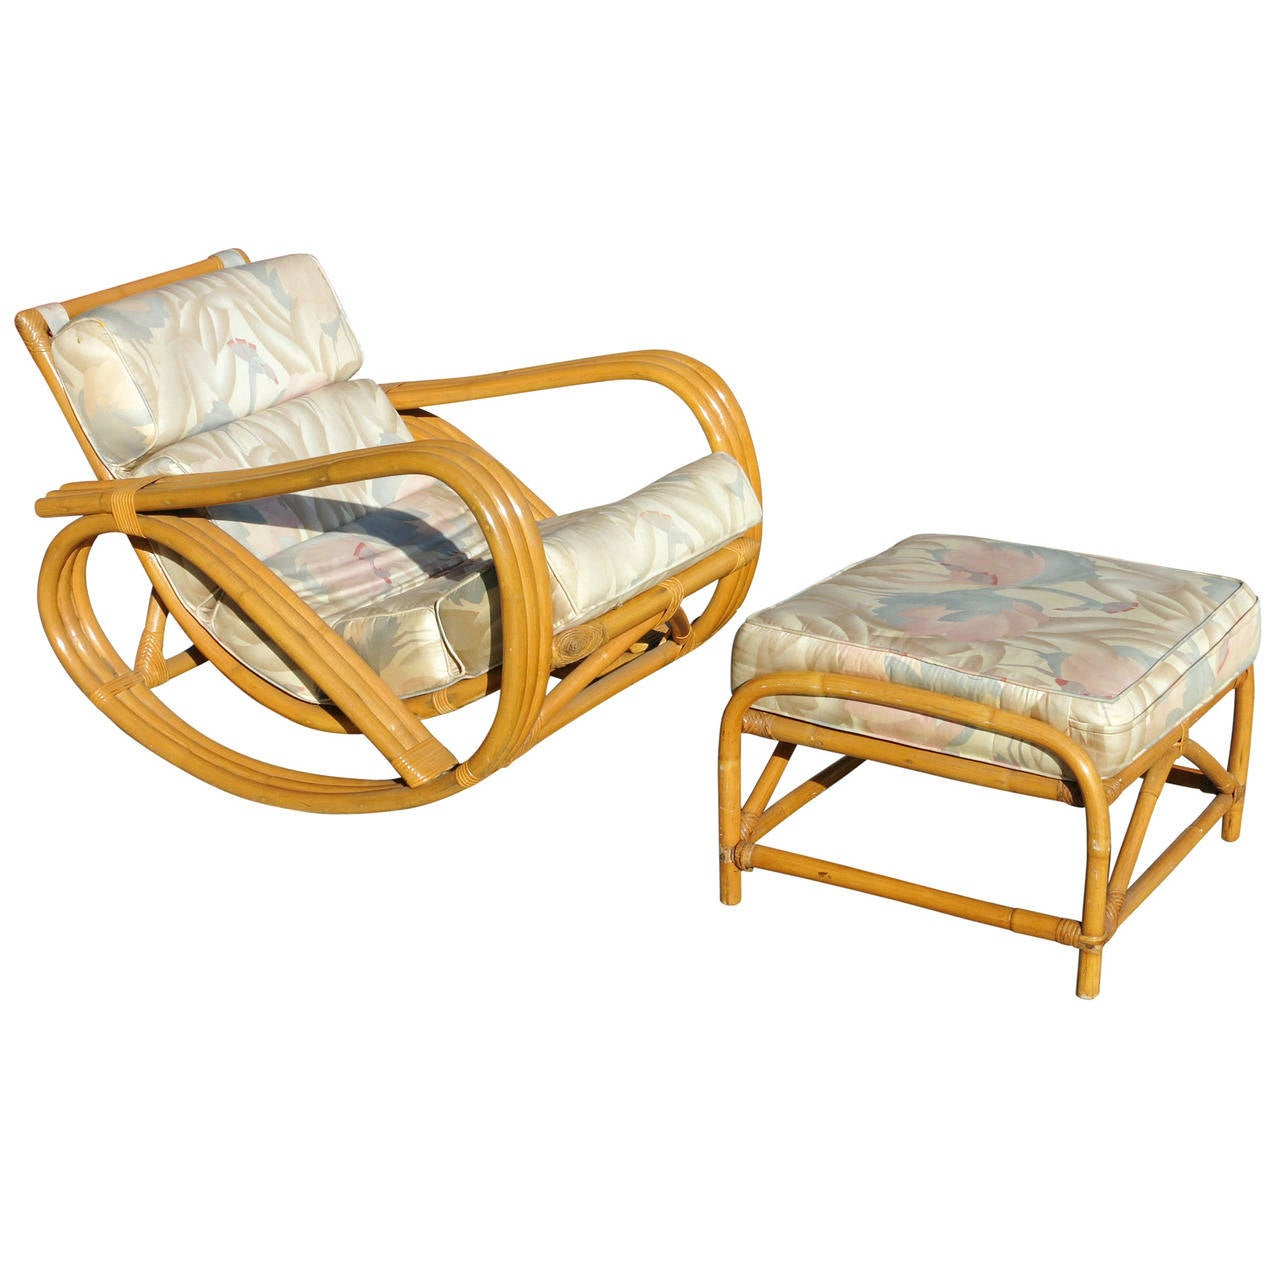 Rare Pretzel Arm Rattan Rocking Chair with Ottoman at 1stdibs